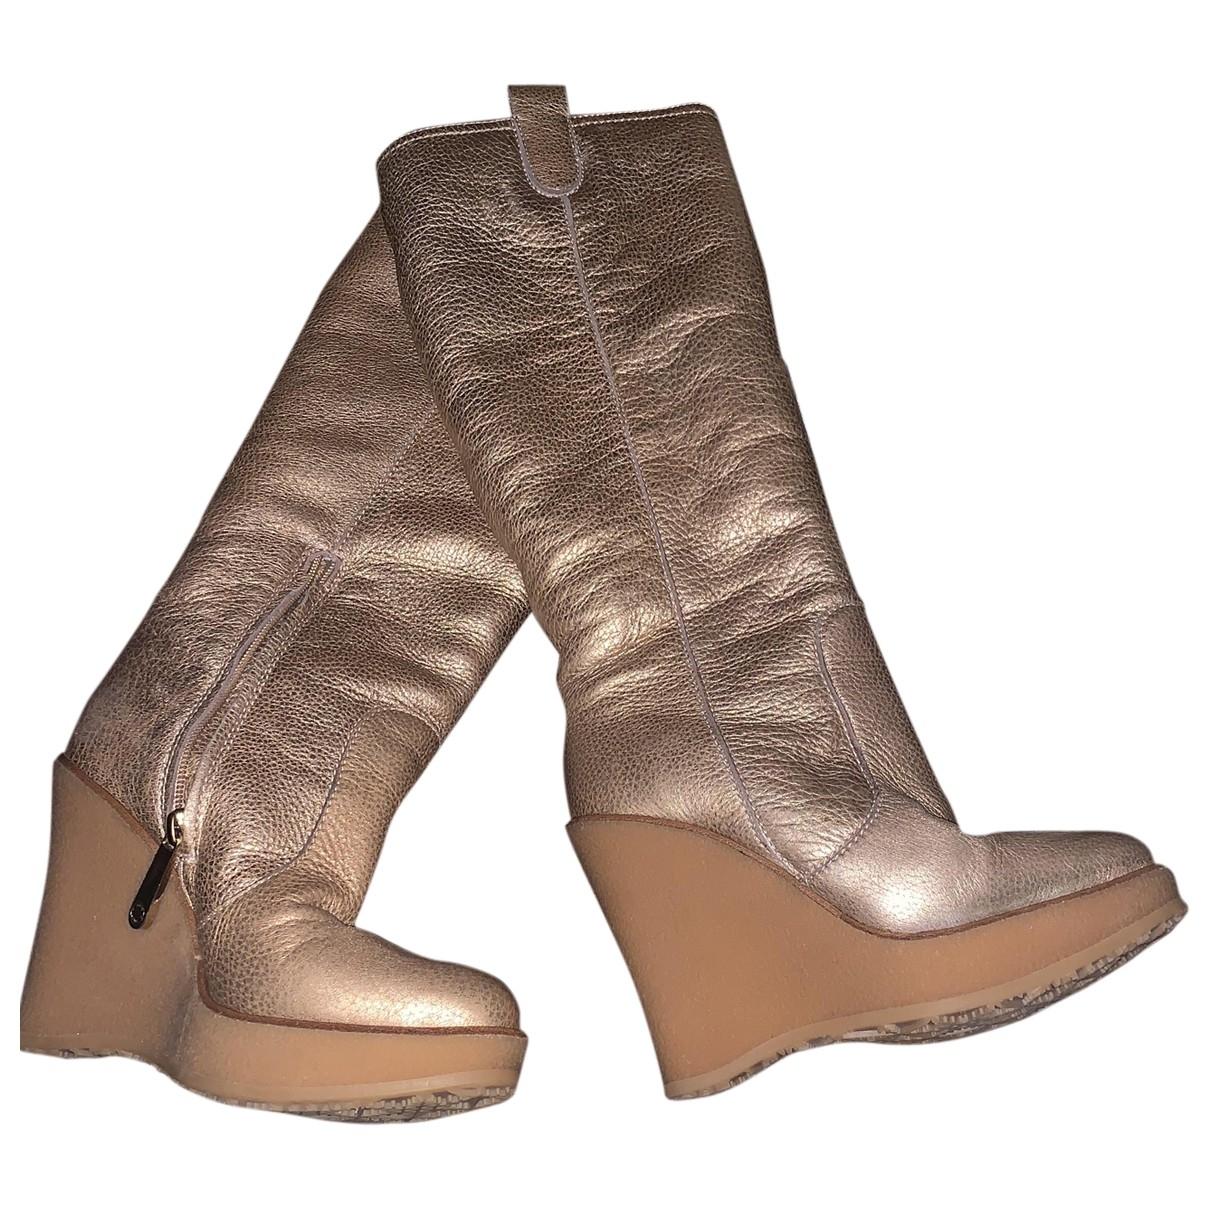 Bally \N Stiefel in  Gold Mongolisches Lamm